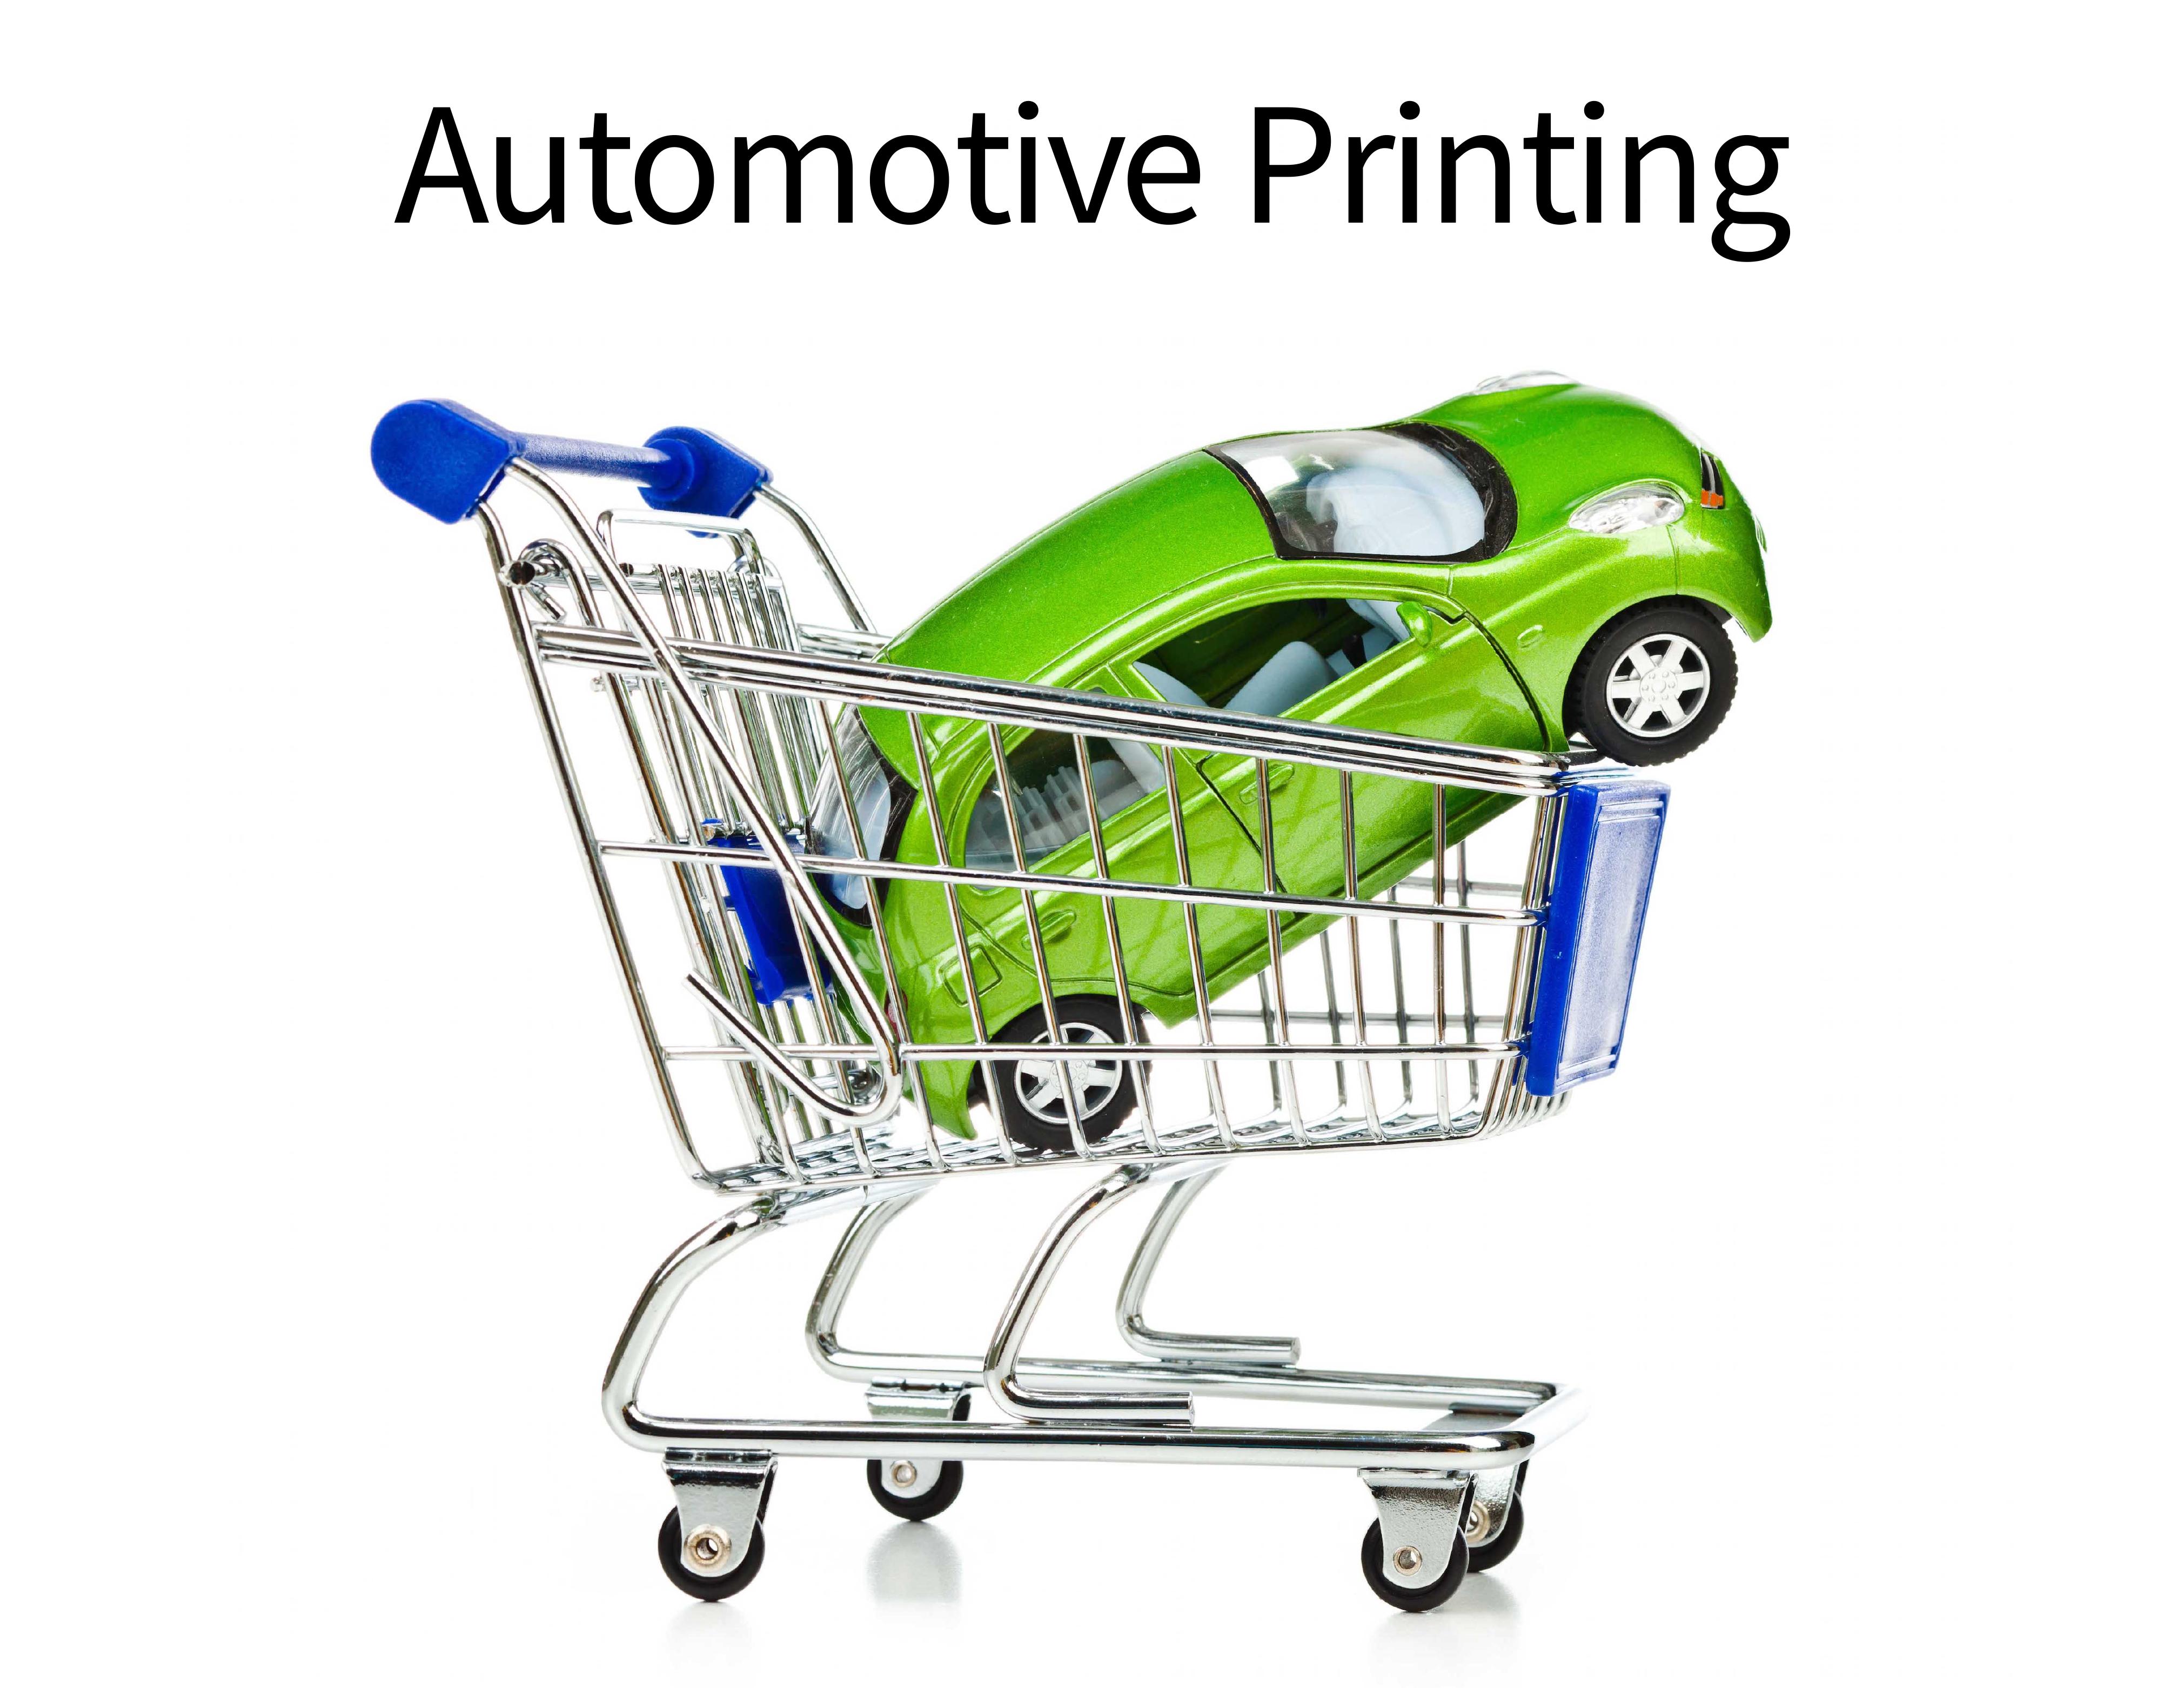 Automotive Printing